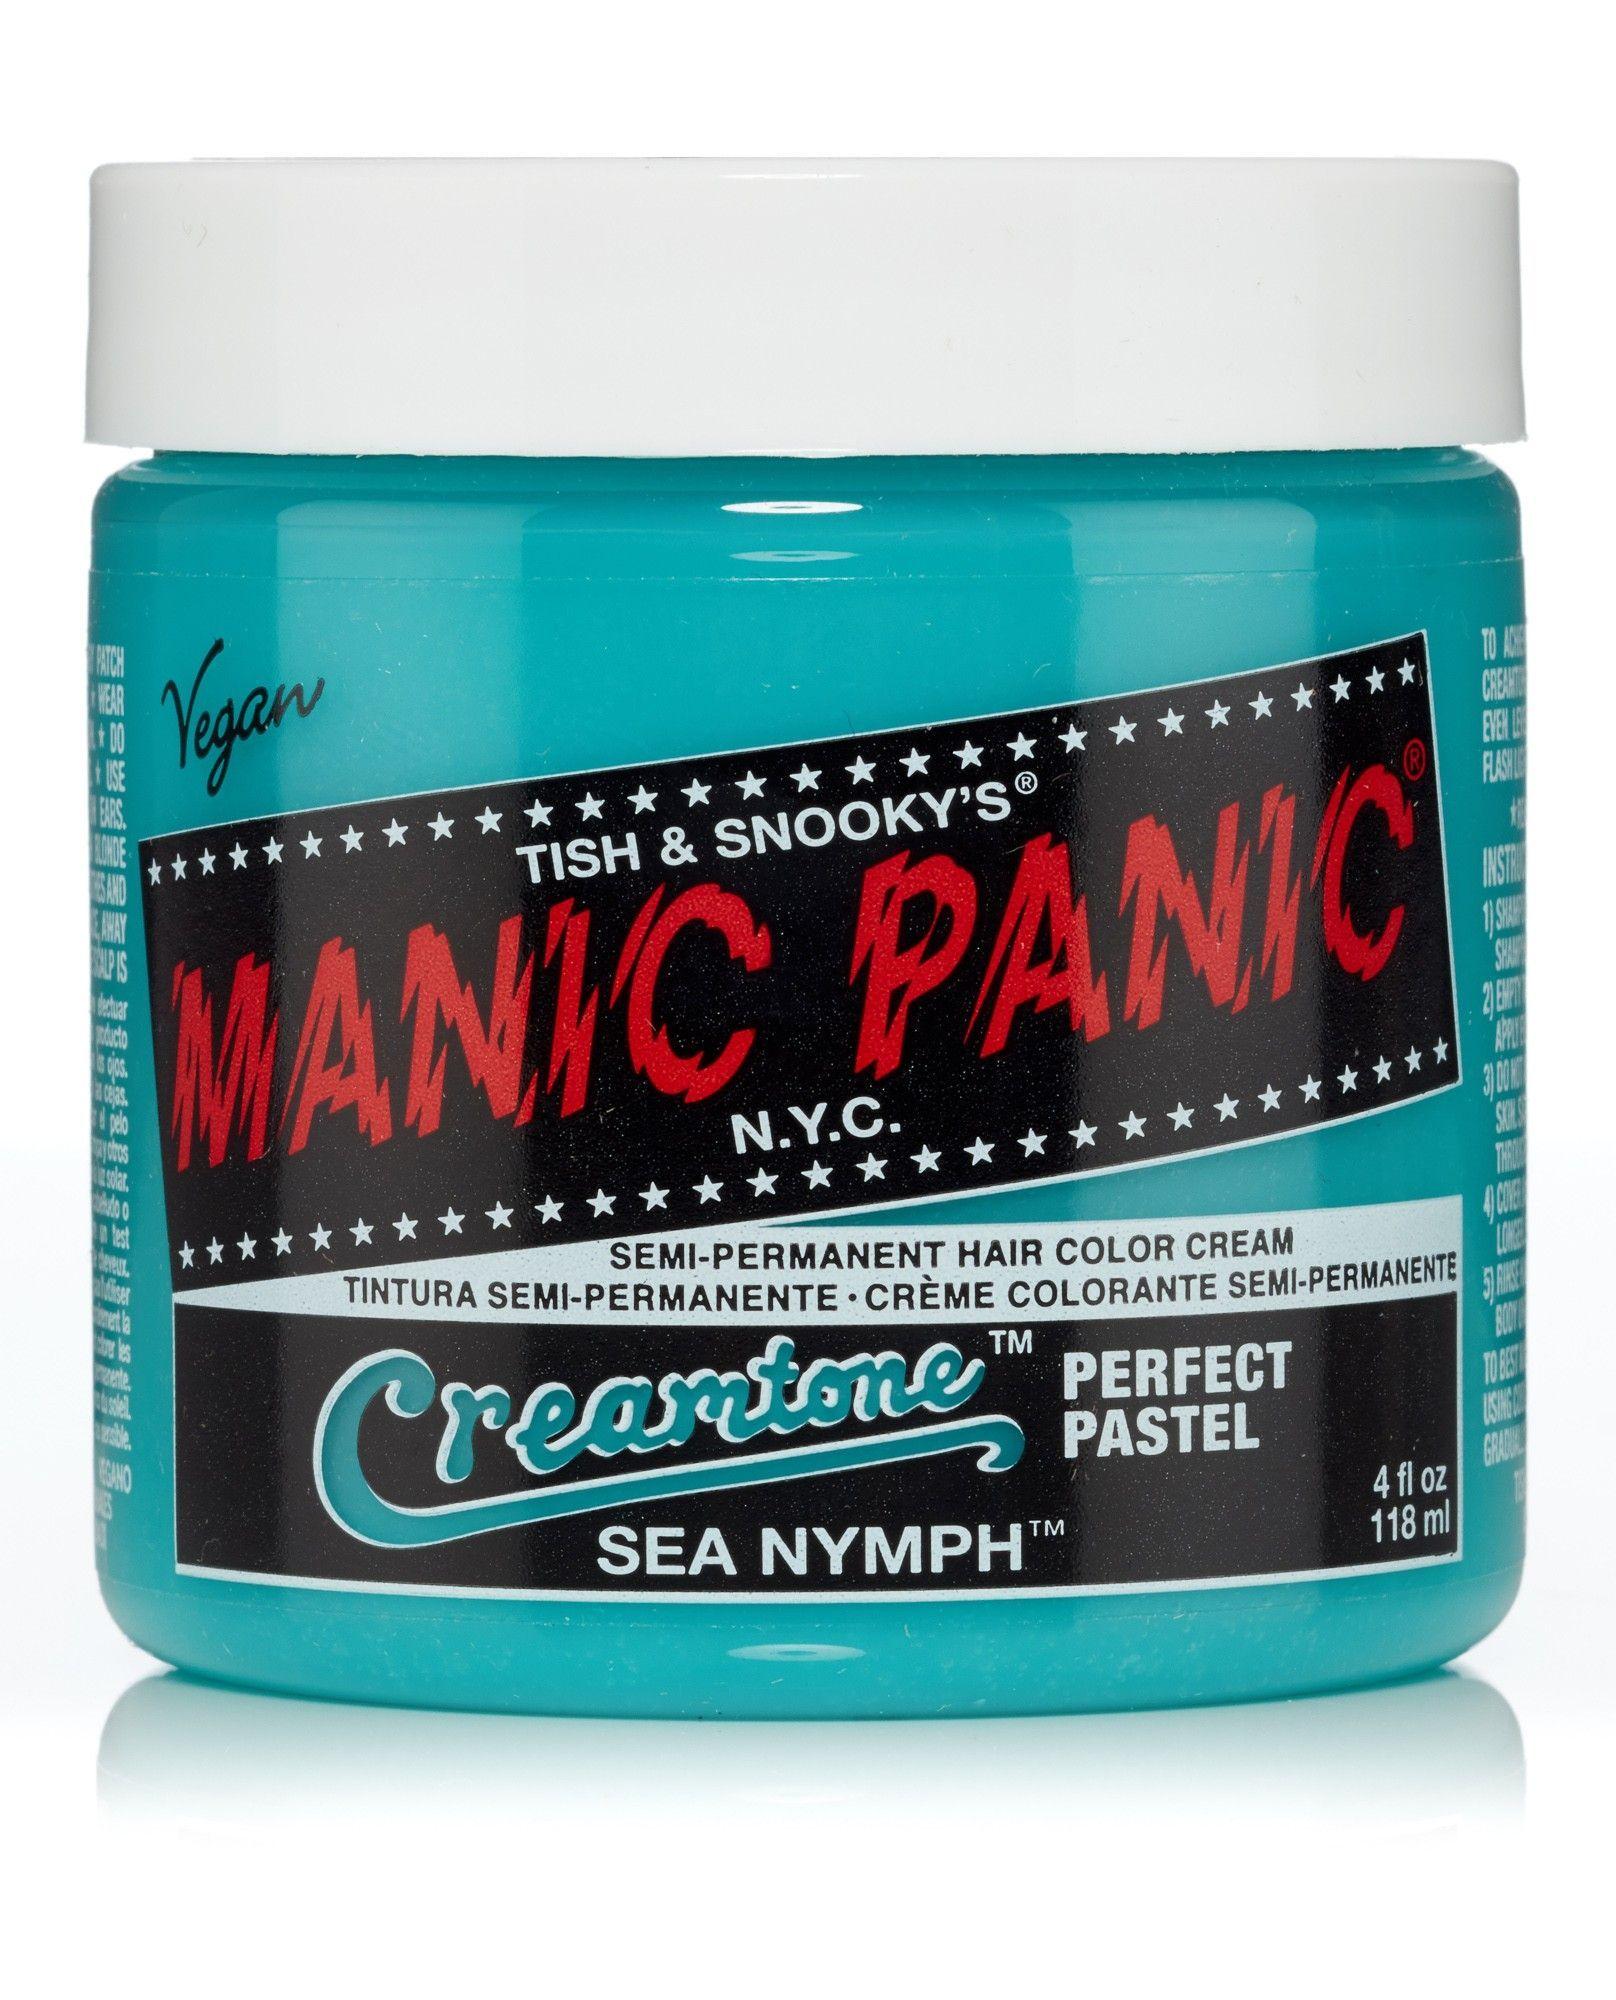 Manic Panic Creamtones Perfect Pastel Hair Colour - Sea Nymph